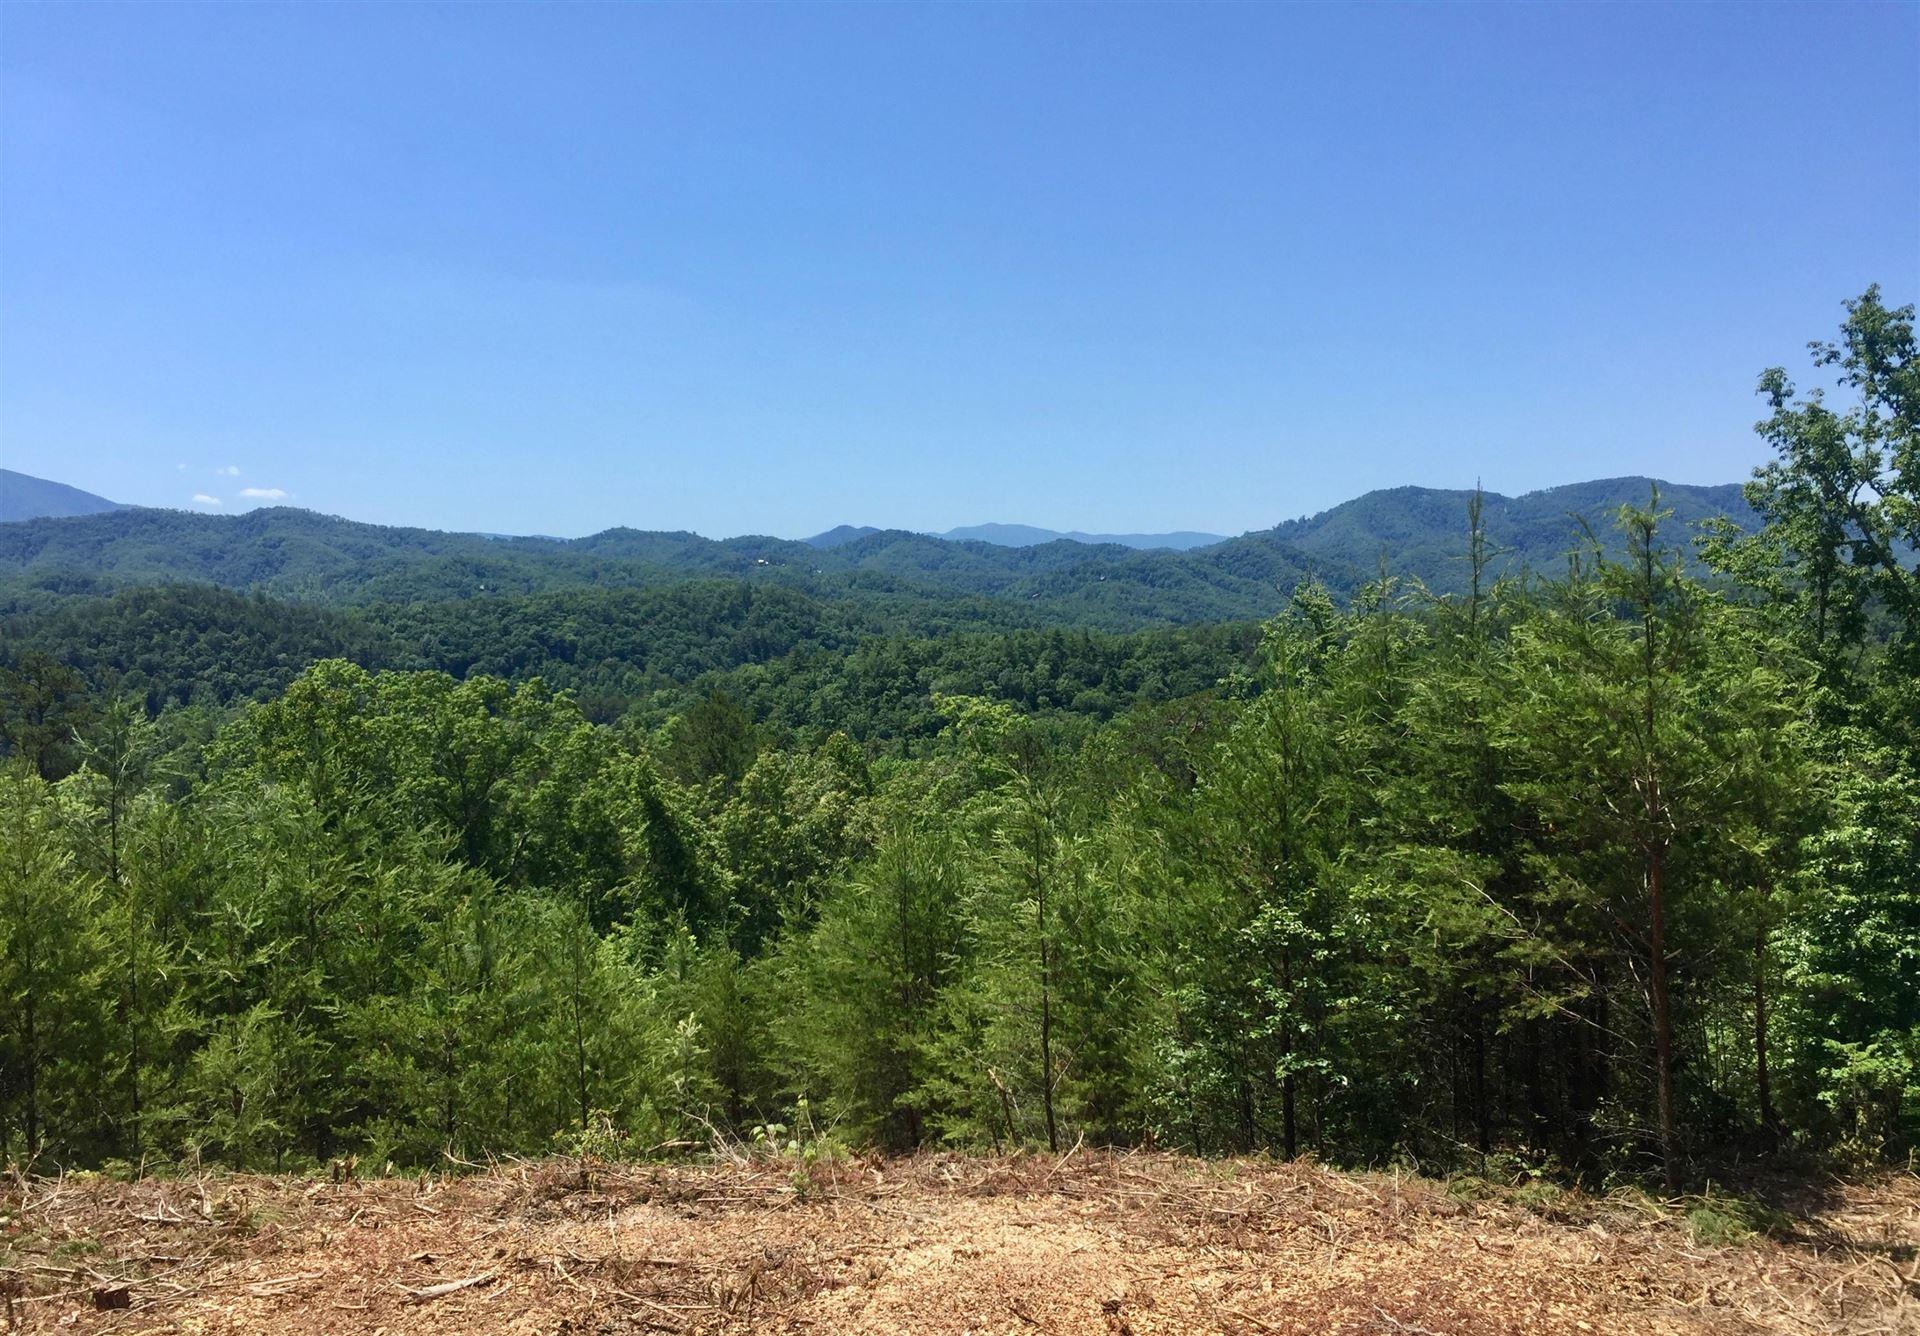 Photo of Lot 6 Summit Trails Drive, Sevierville, TN 37862 (MLS # 1149126)